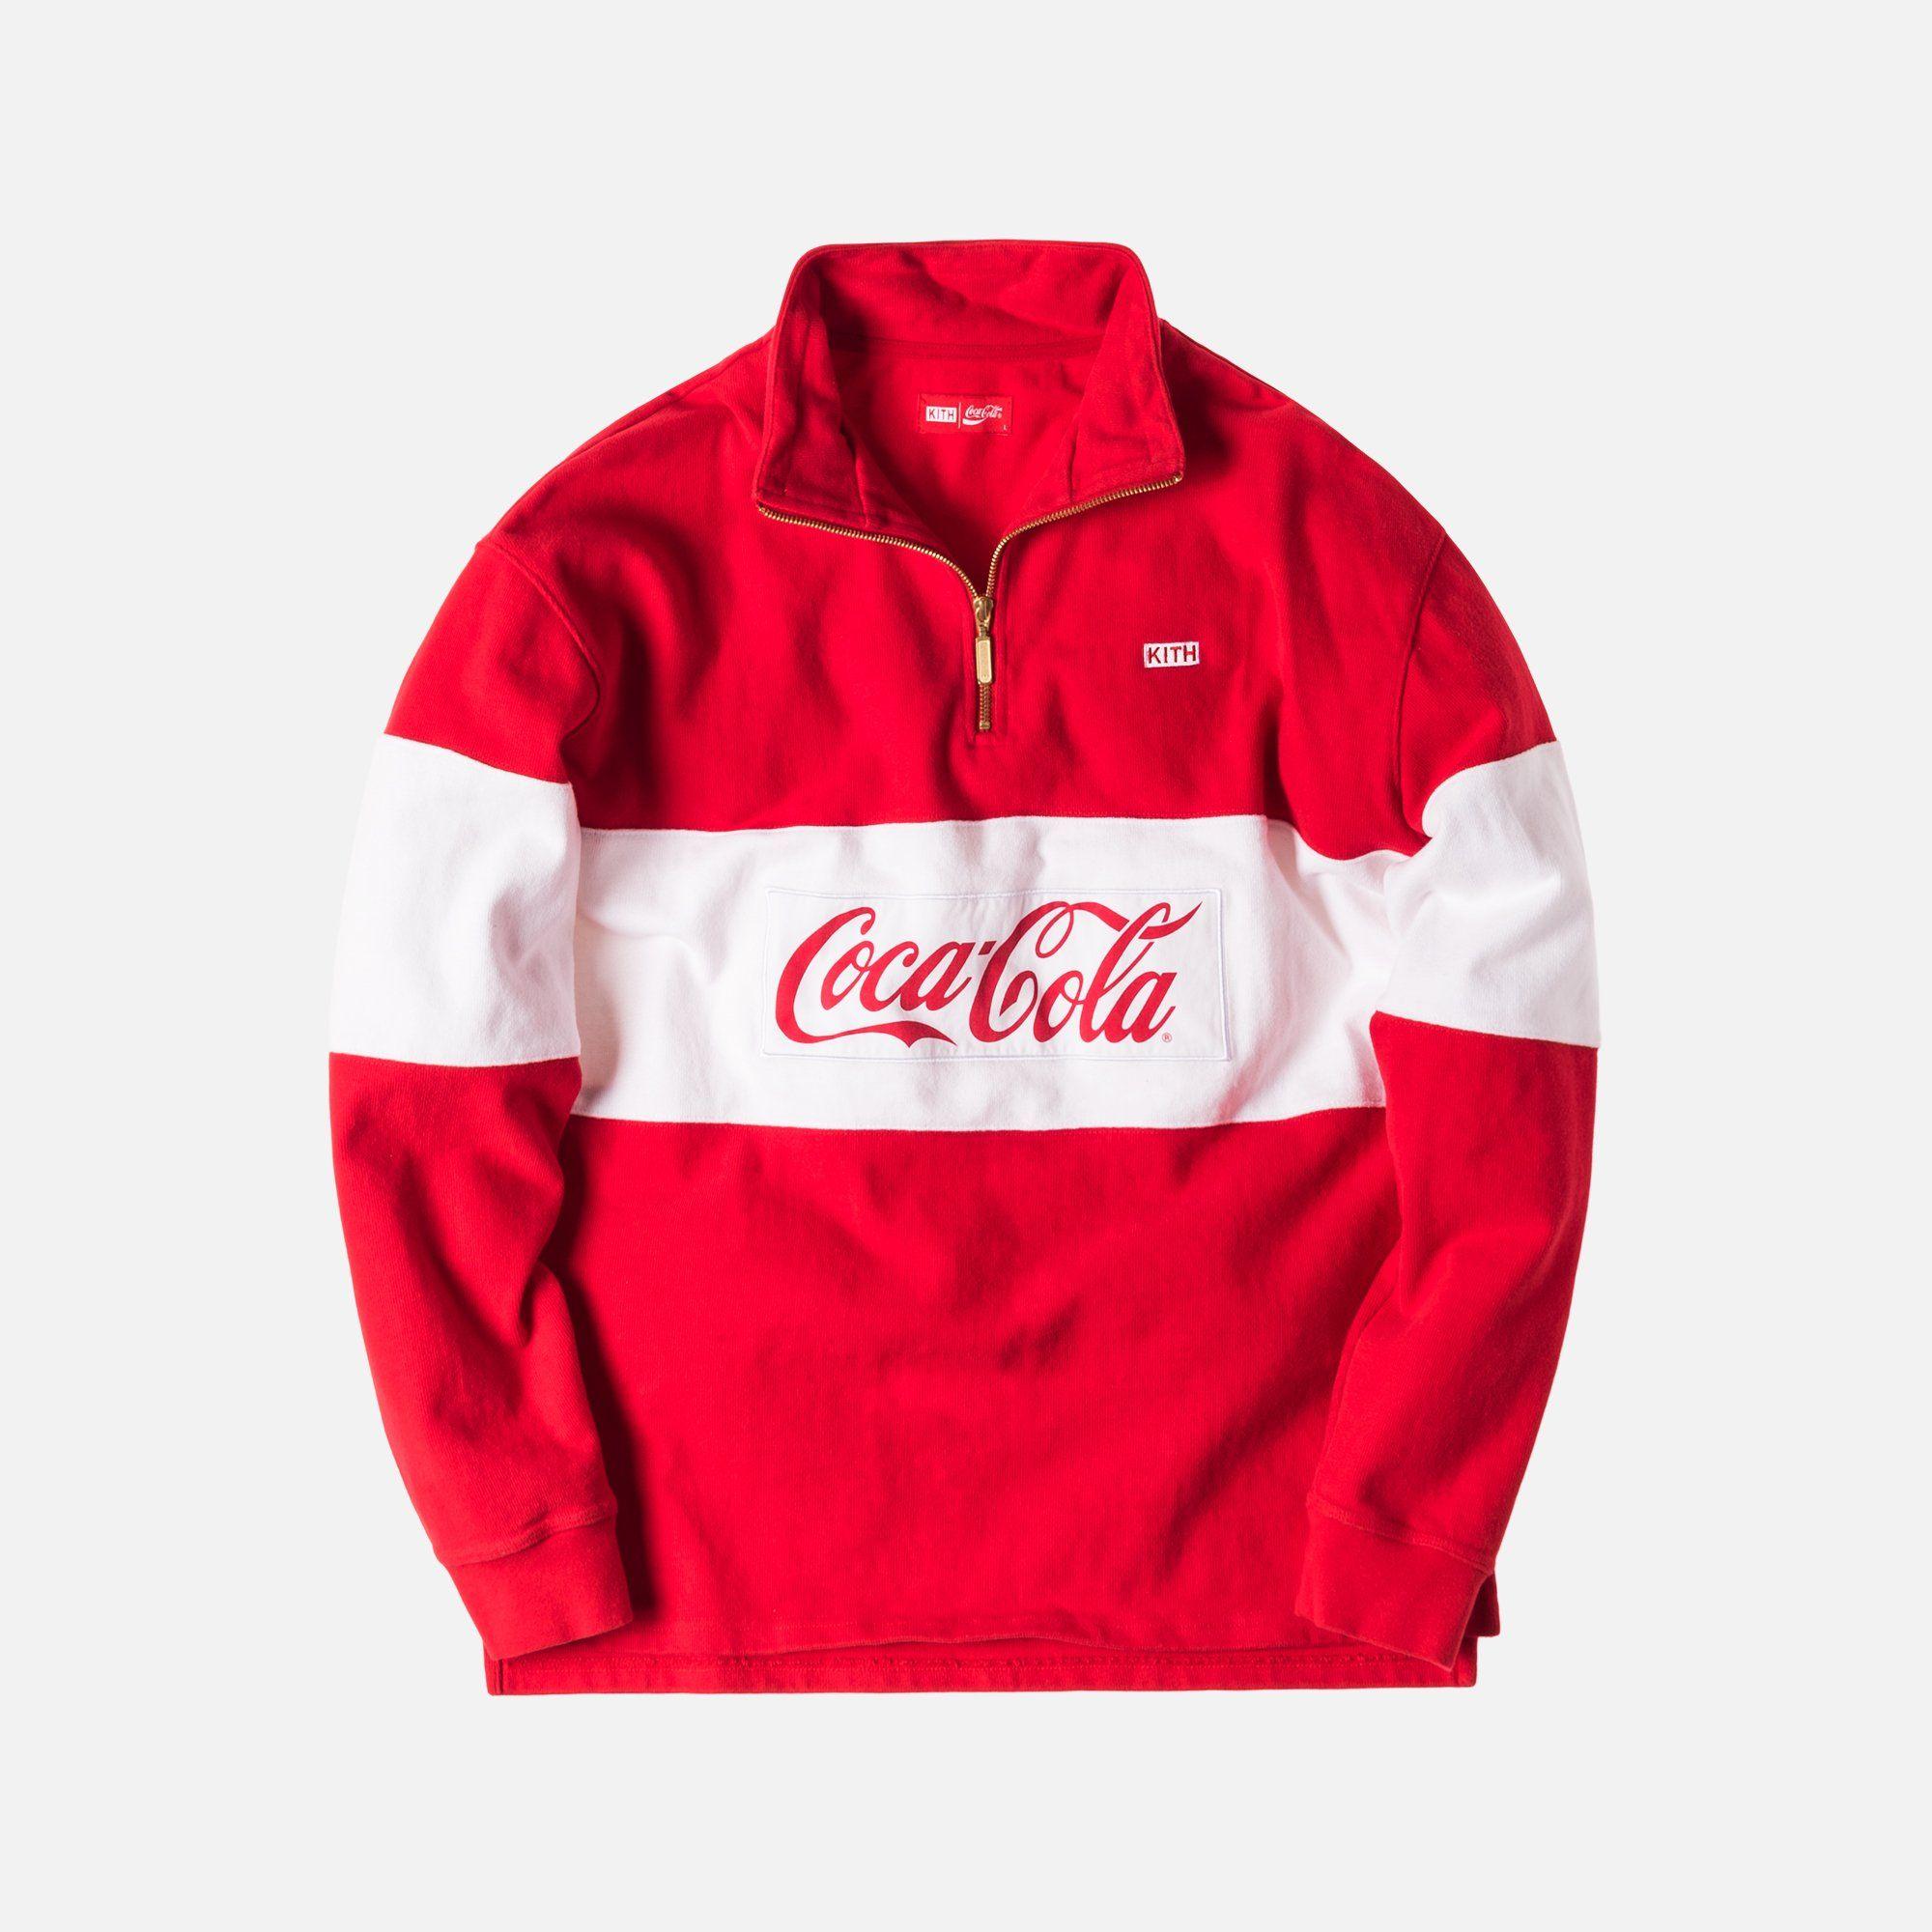 d6be88ff0459 Kith x Coca-Cola Half Zip Rugby - Red Half Zip Pullover